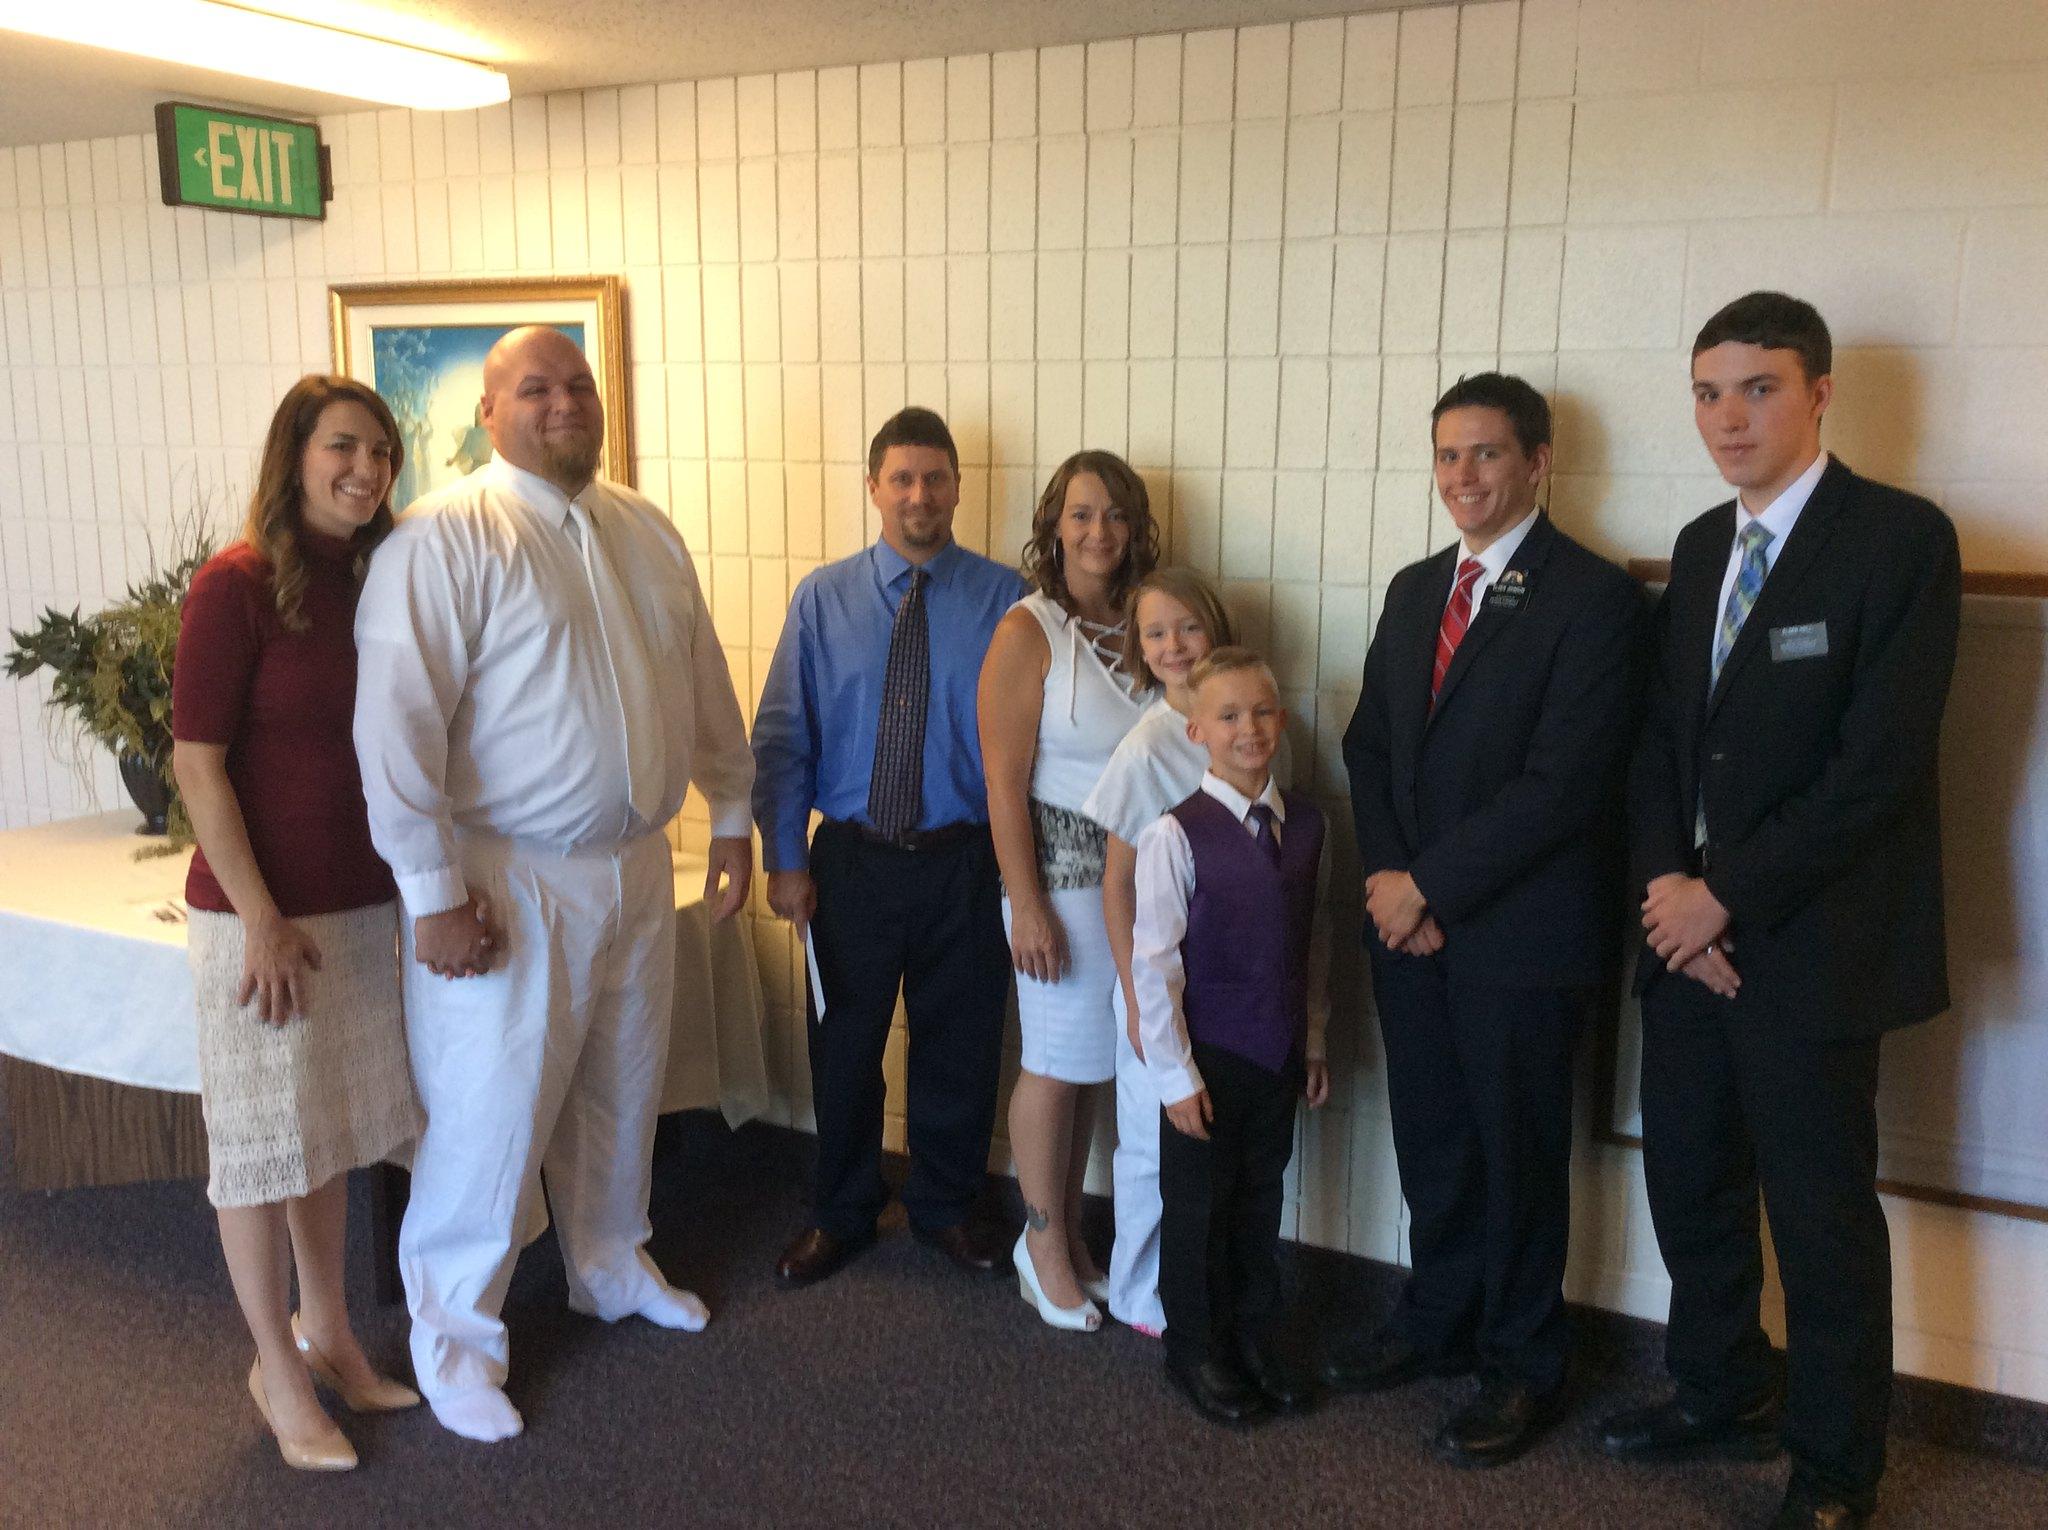 Brooklyn's baptism